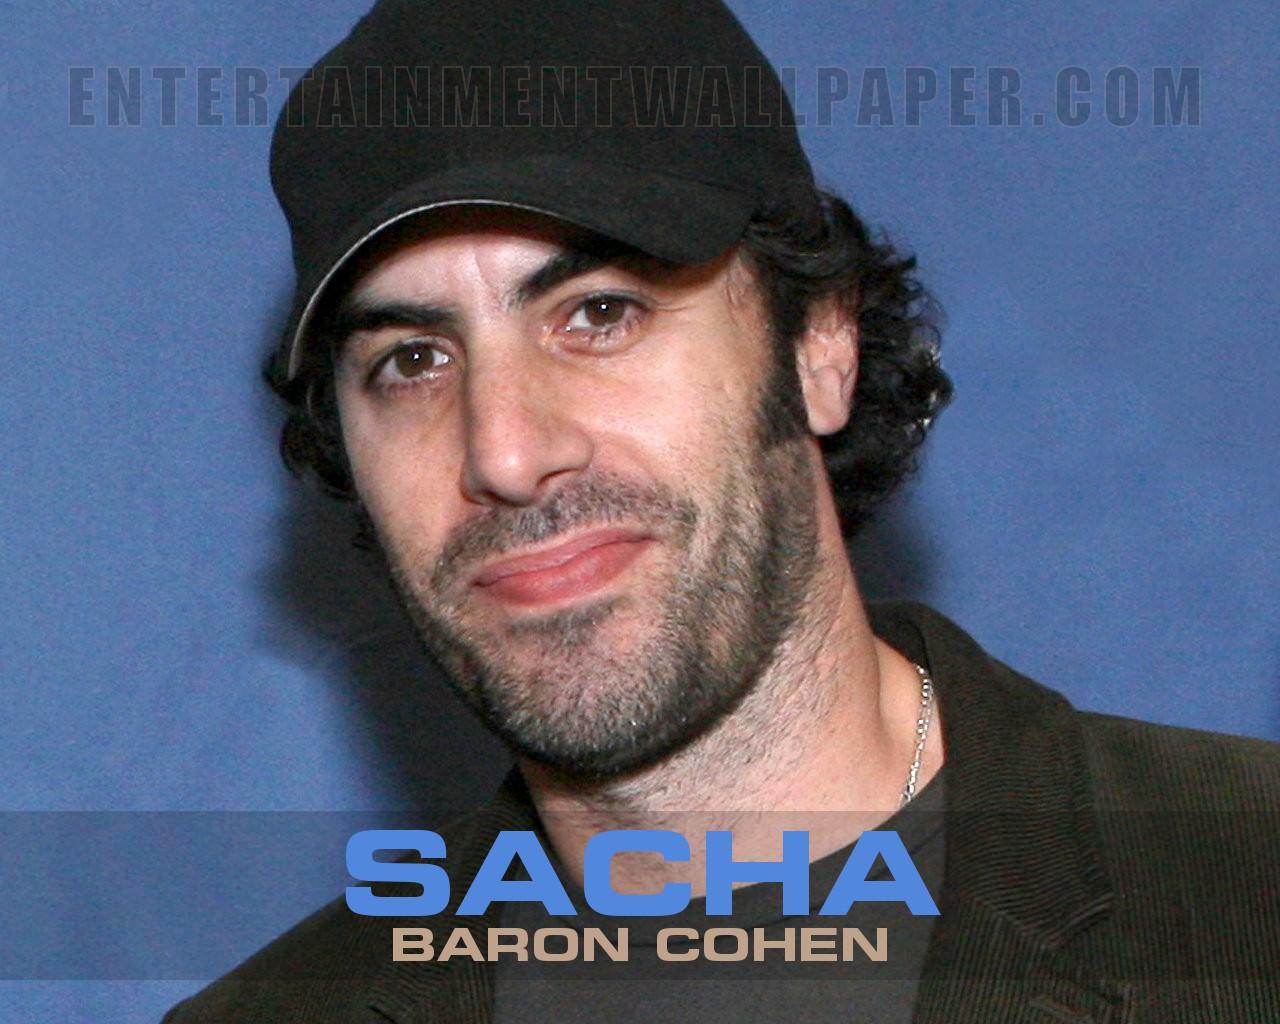 Sacha Baron Cohen Wallpaper - Original size, download now.